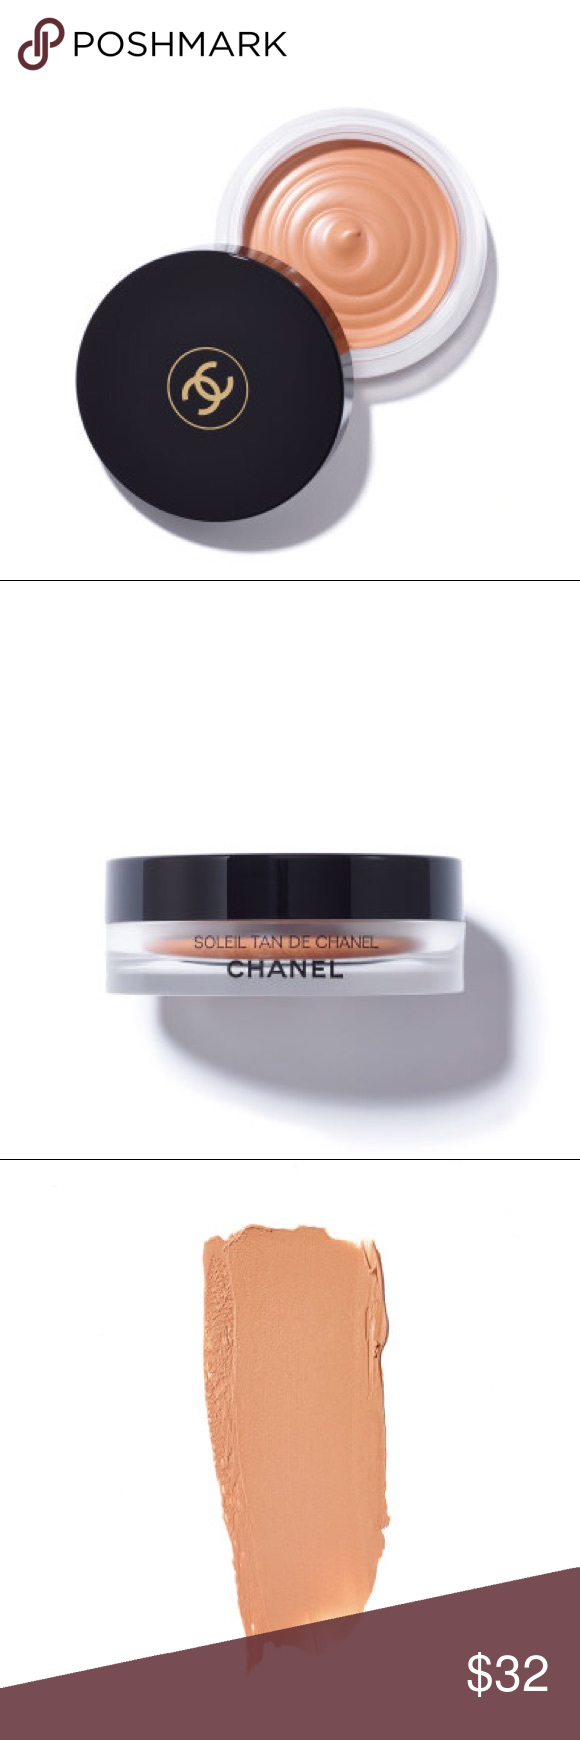 CHANEL Soleil Tan De Chanel Bronzing Makeup Base Used a